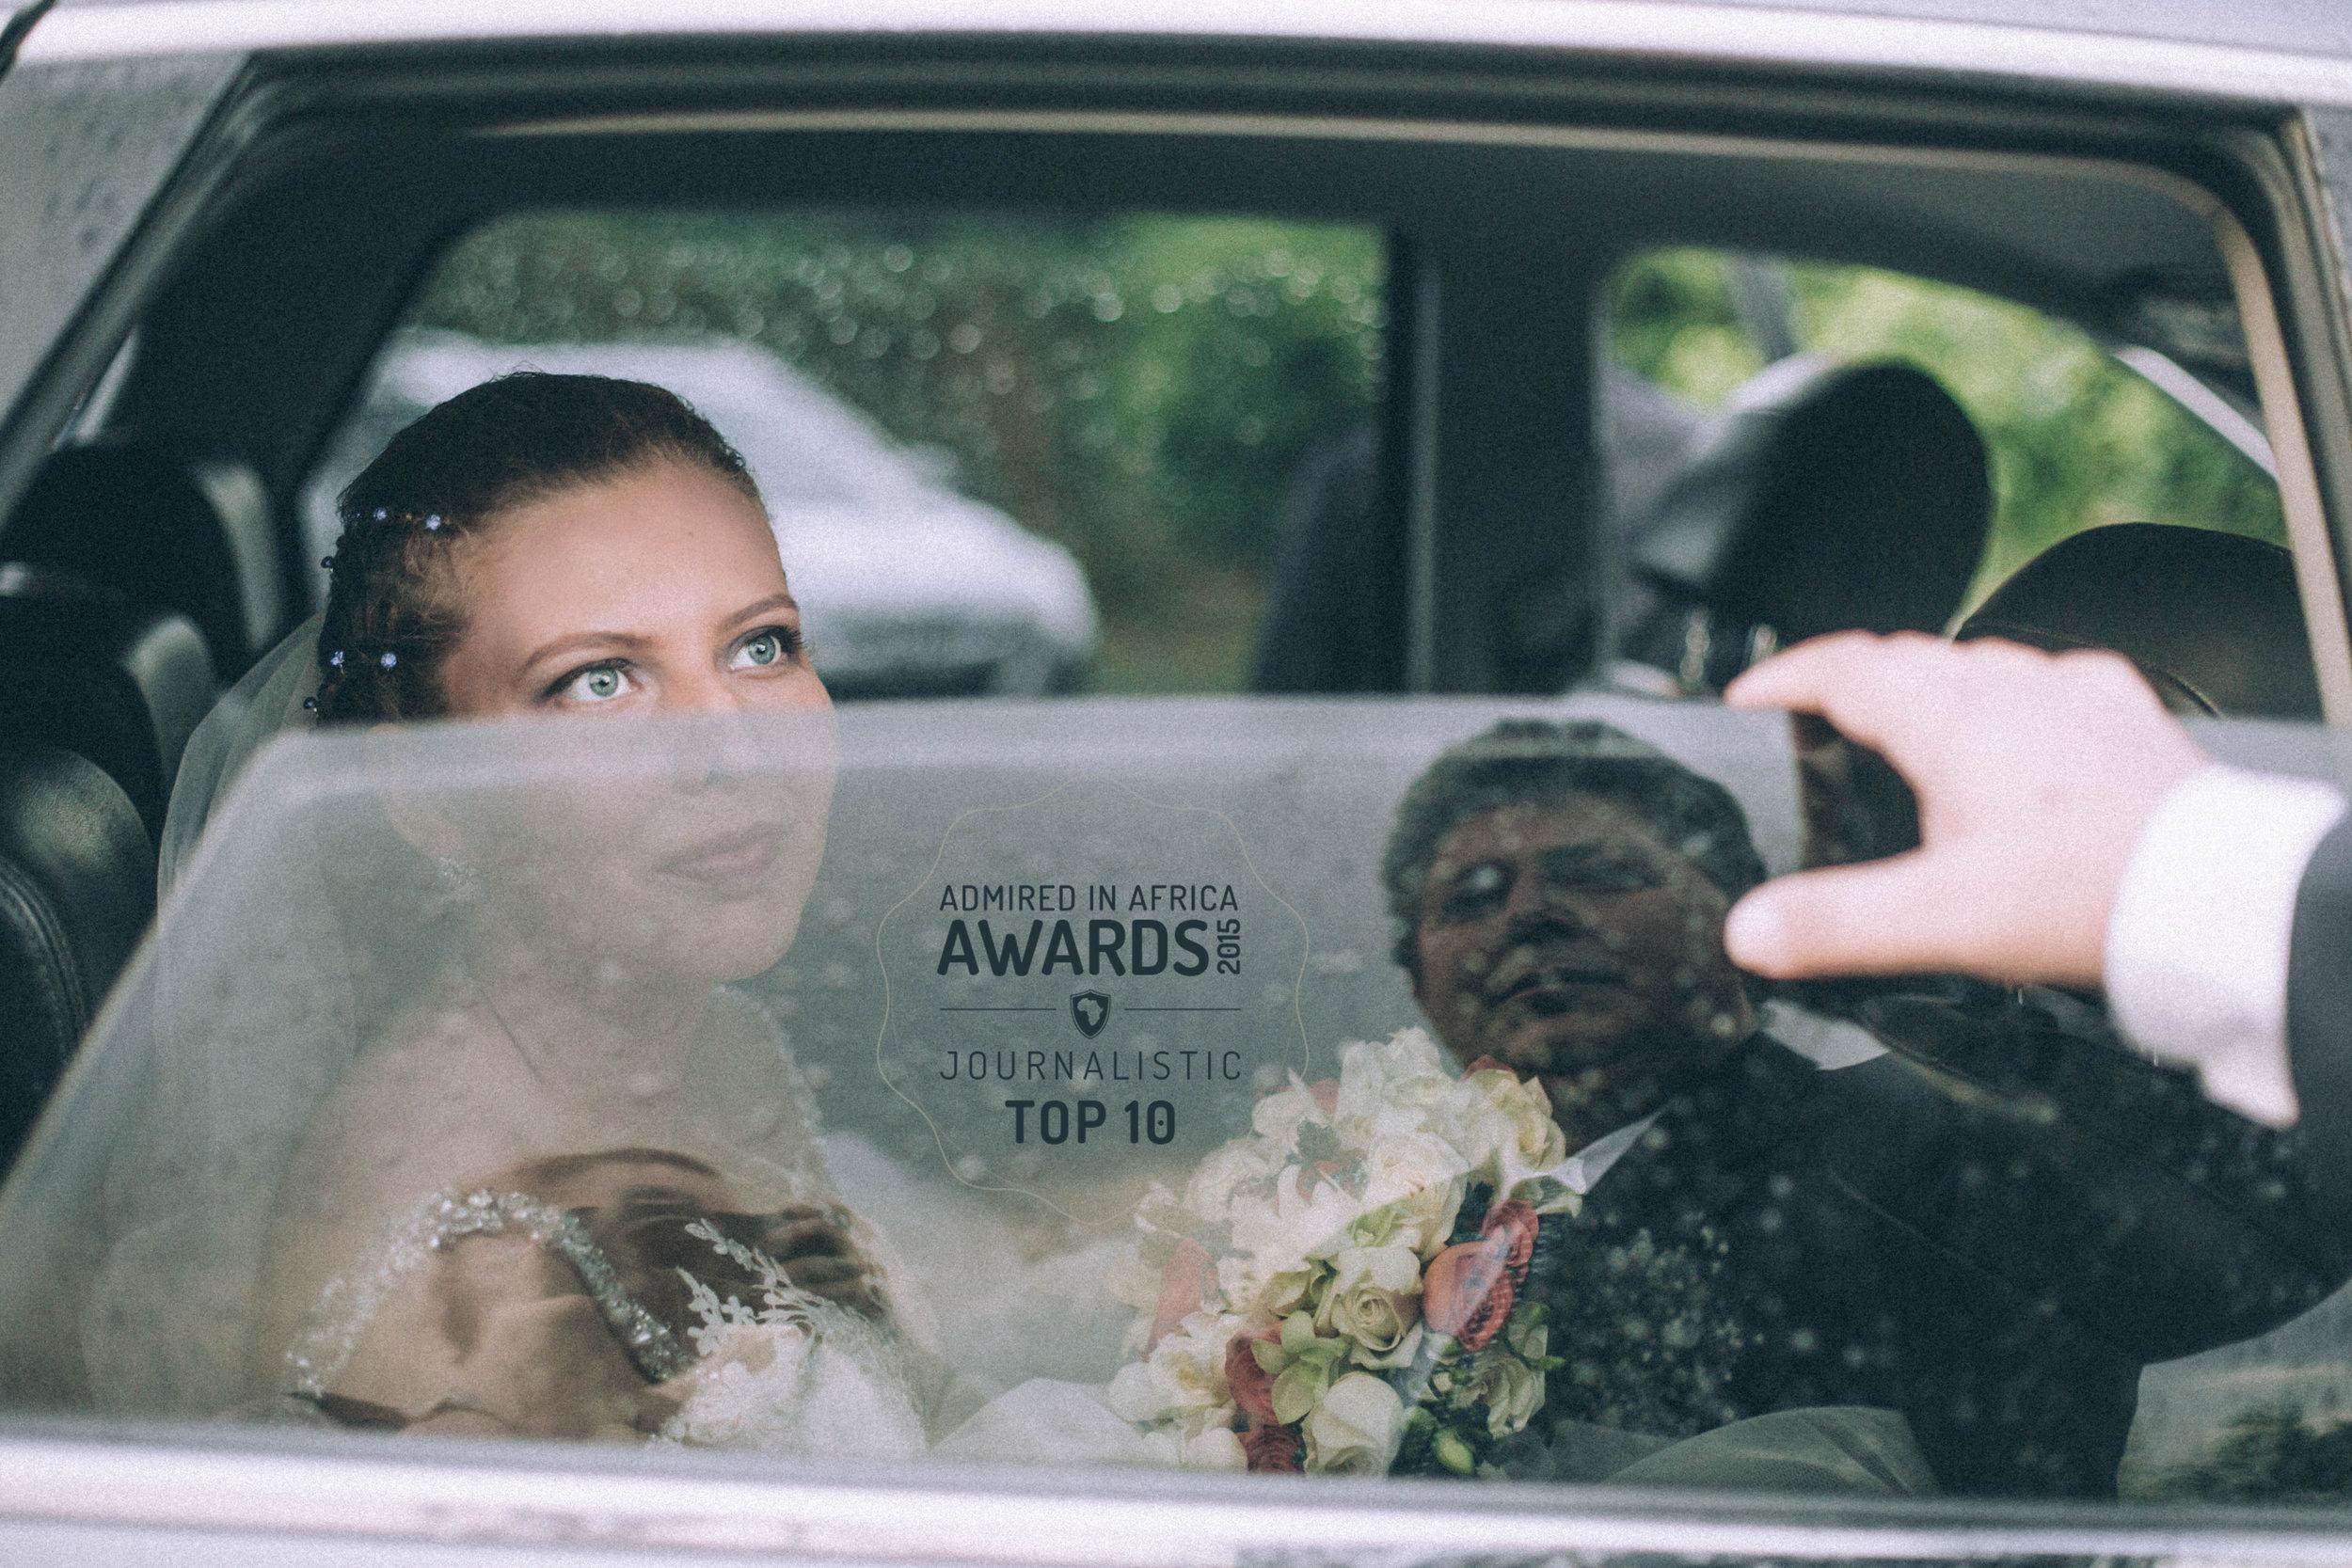 documentaryweddingphotographycapetownronelkruger.jpg